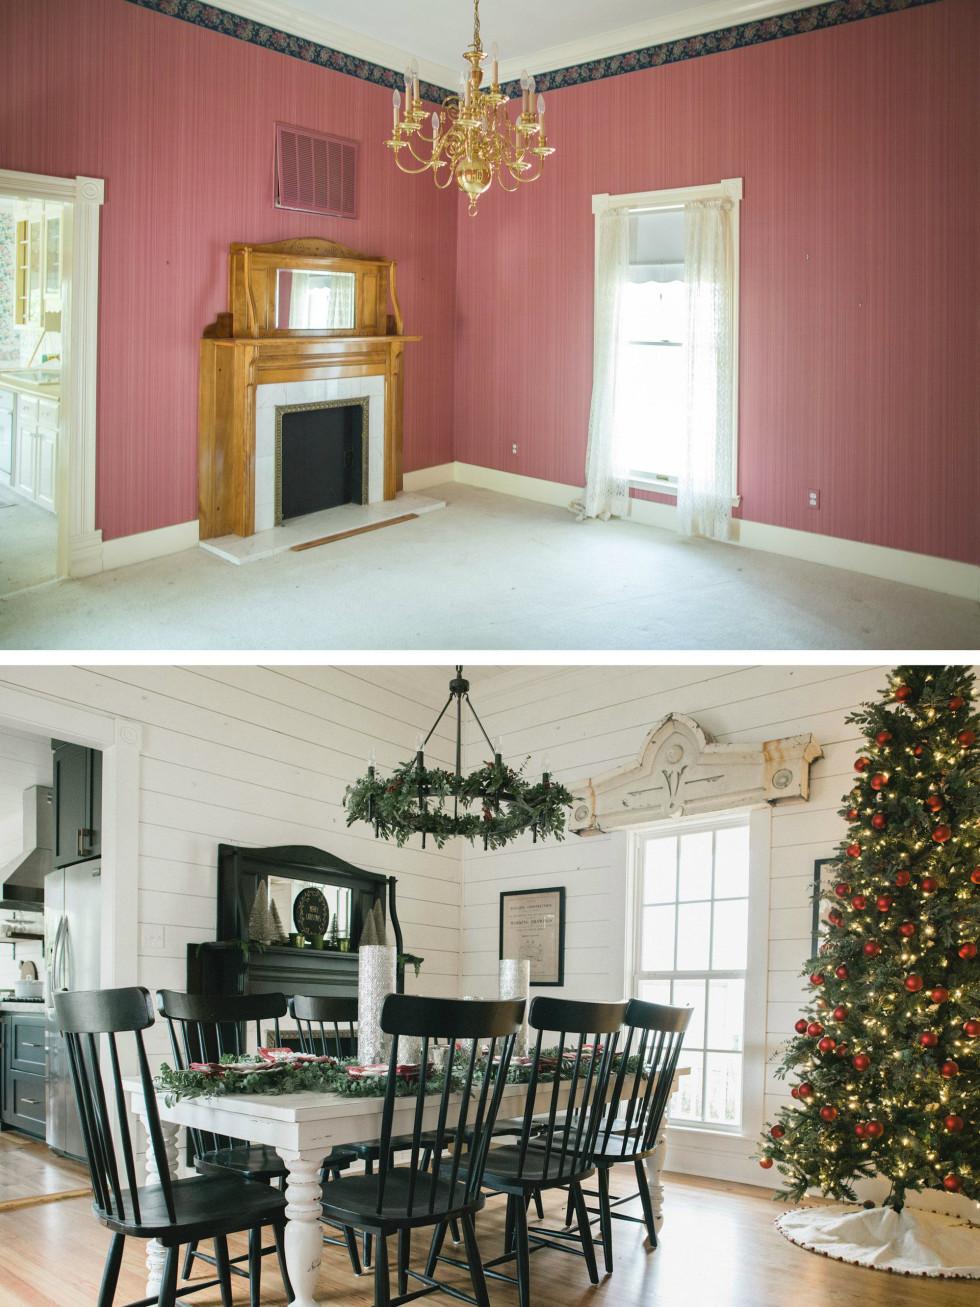 Magnolia House dining room